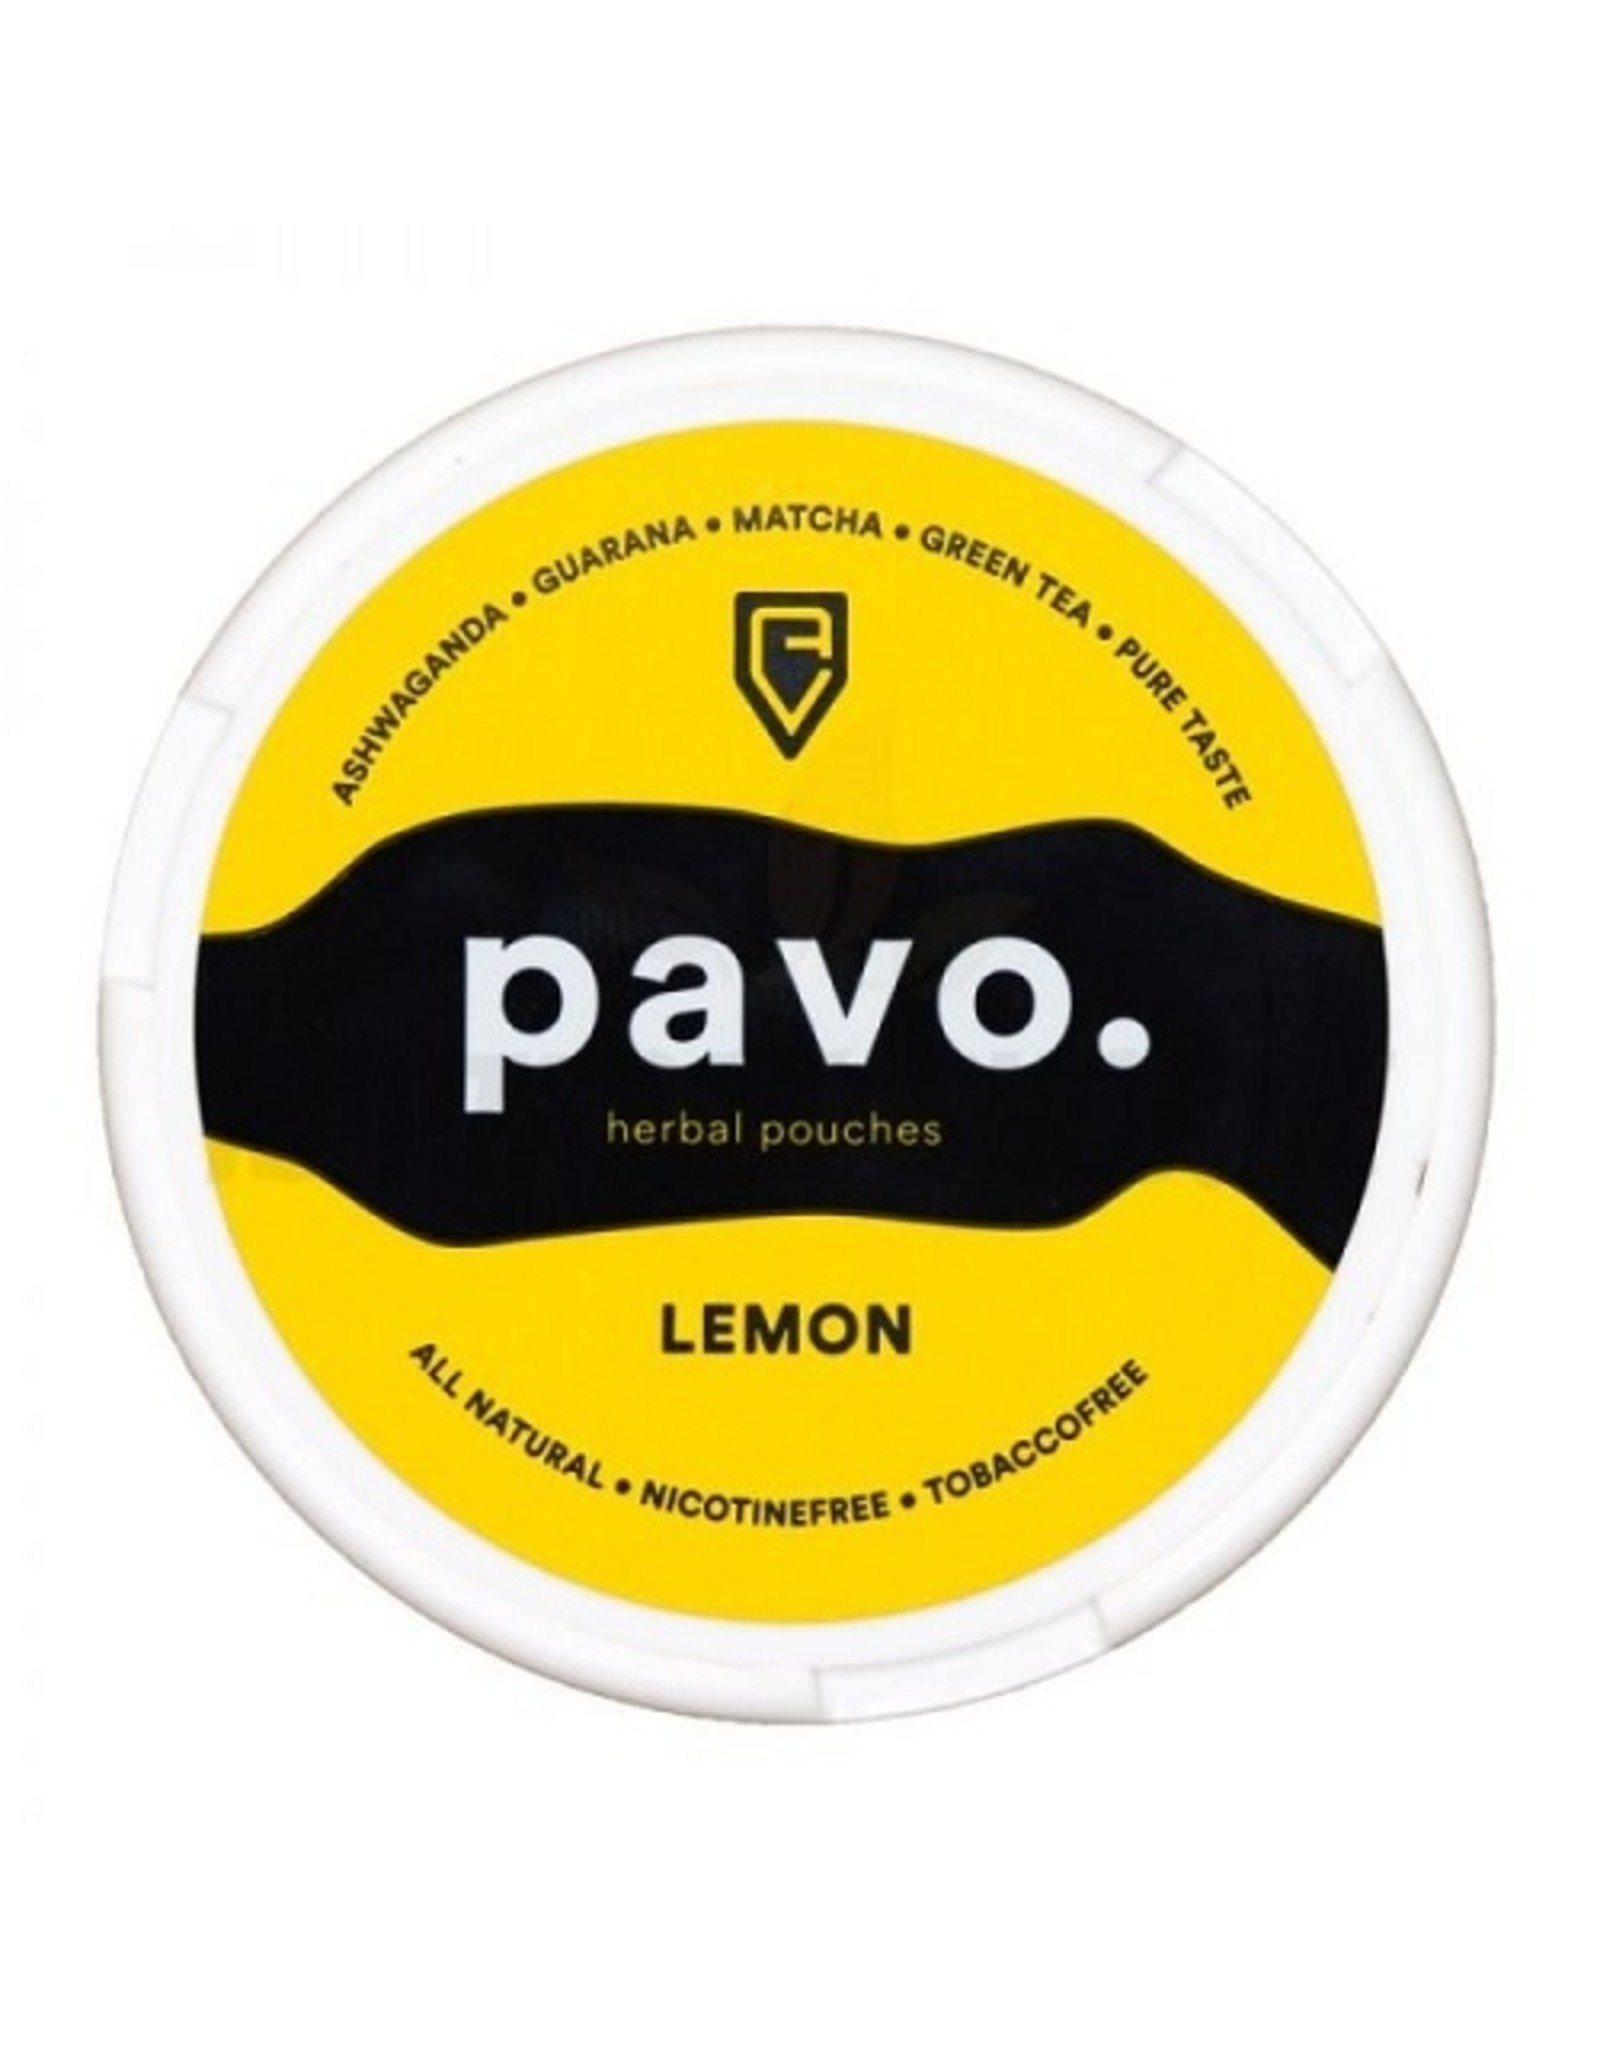 PAVO PAVO Lemon Herbal Pouches